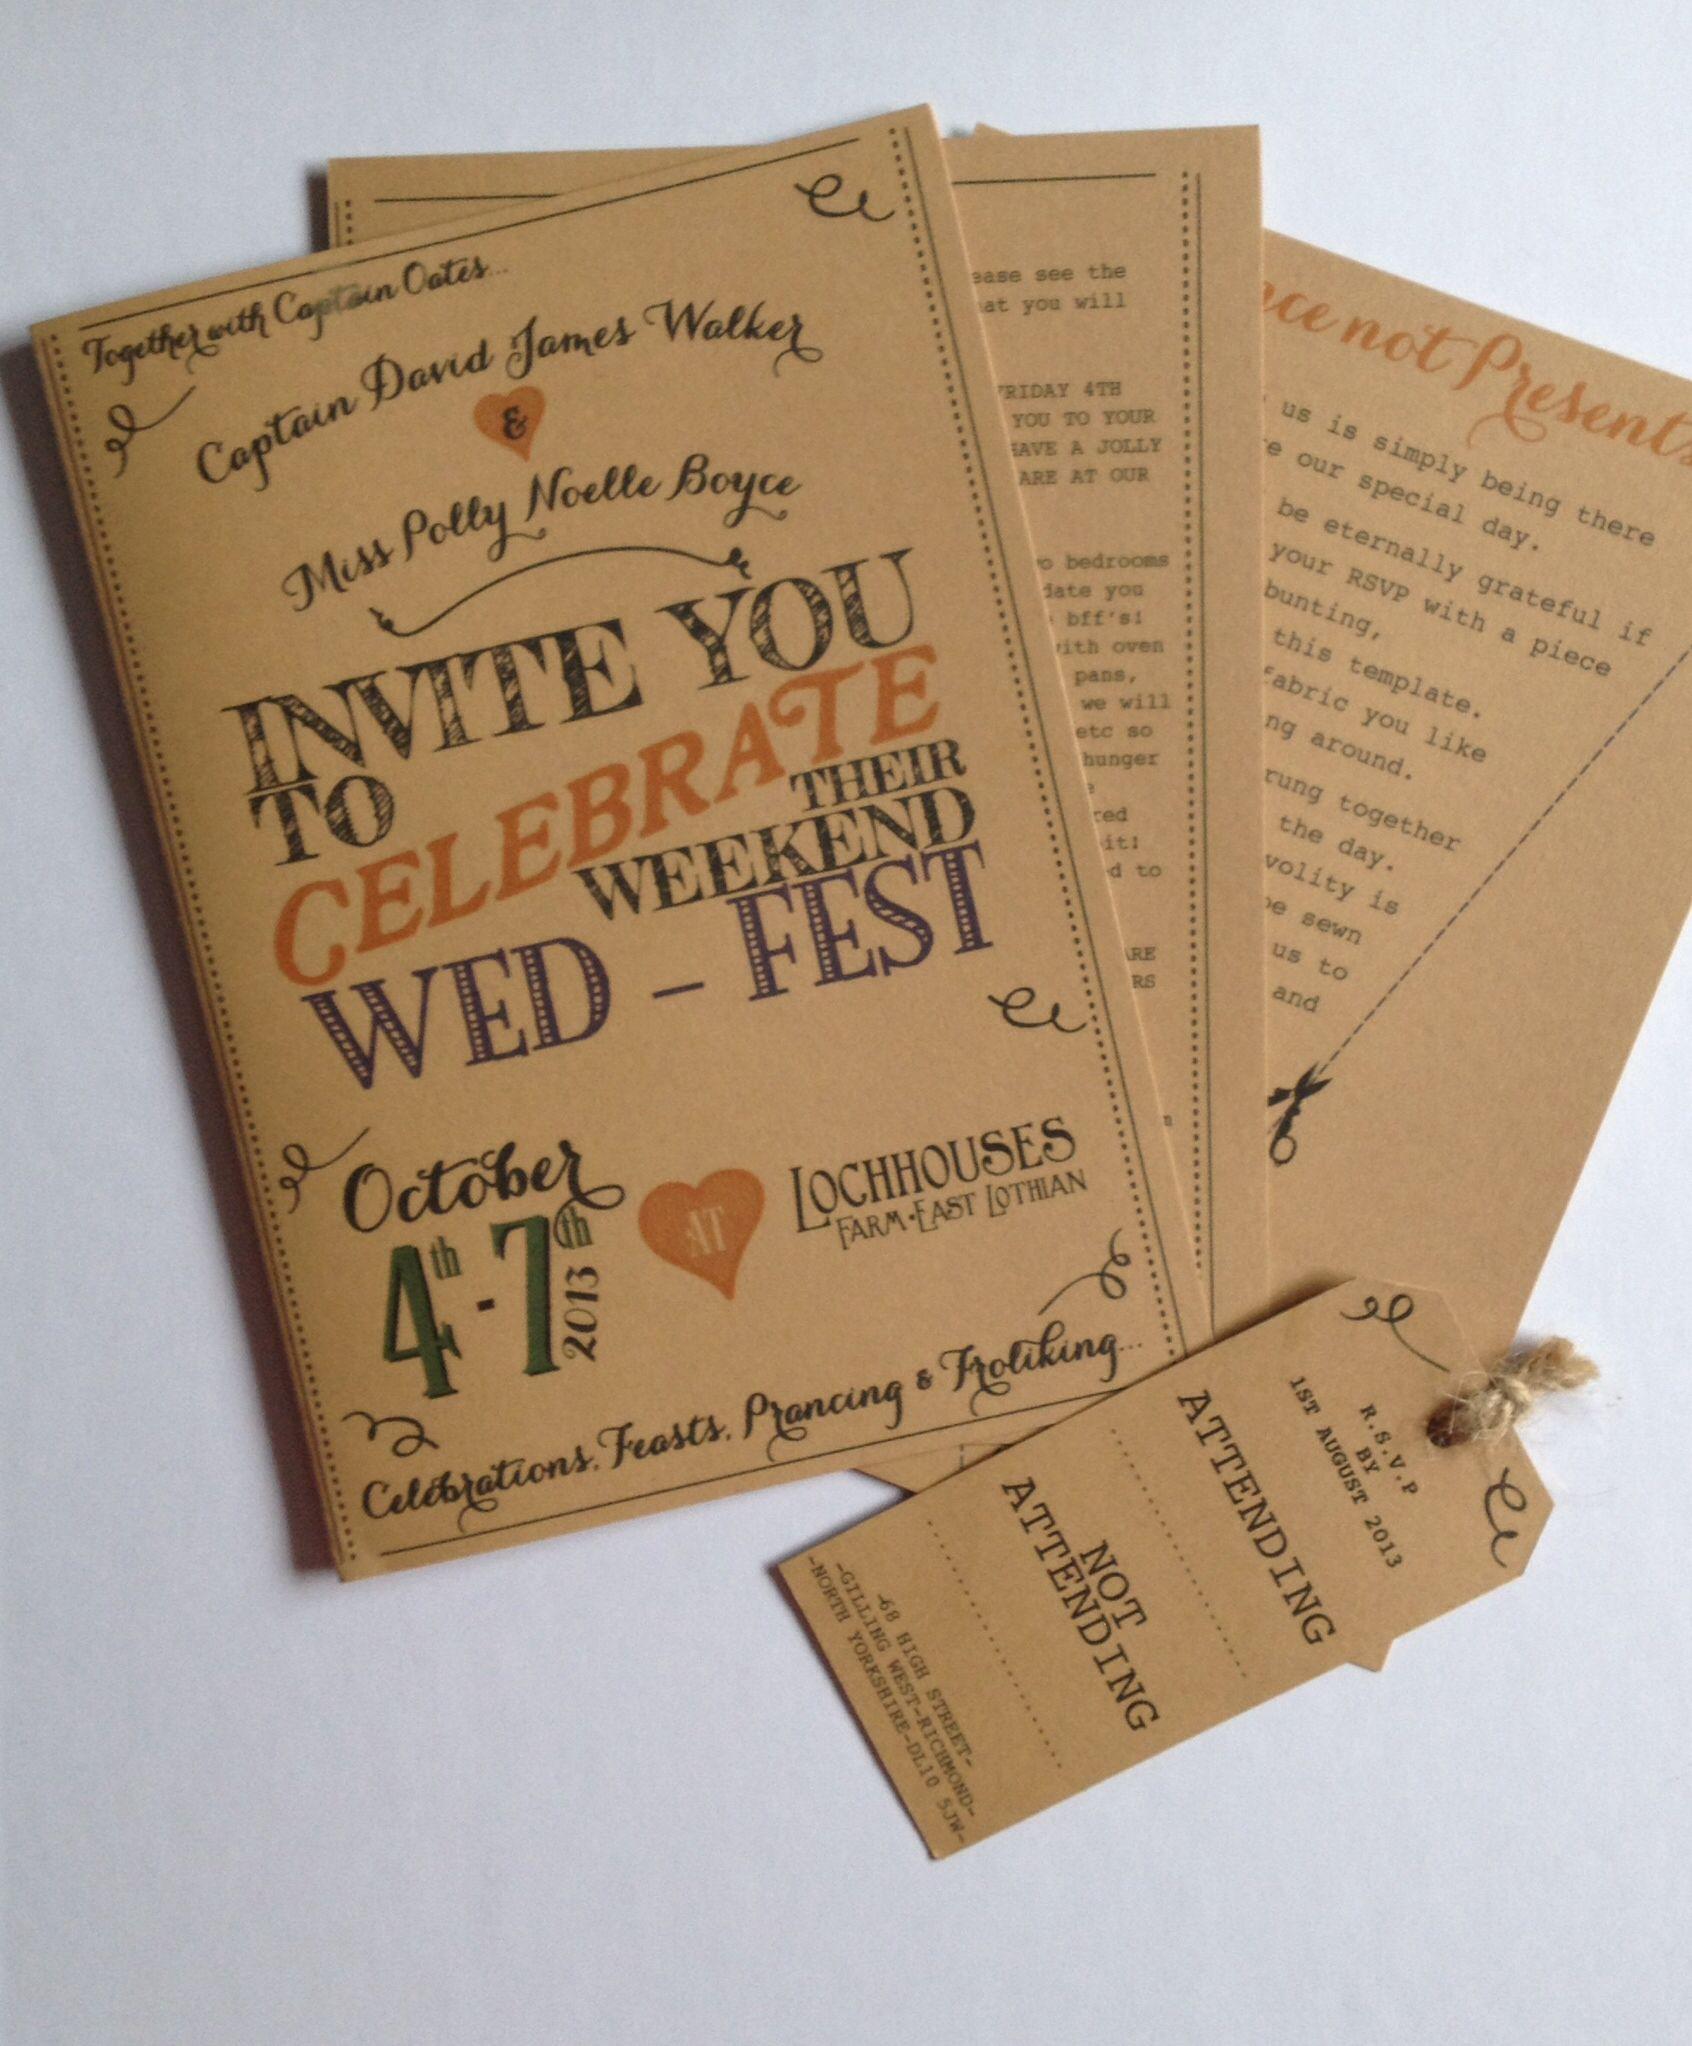 Wedding Invites Scotland: Wed-Fest: Wedding Invites For Autumnal Scottish Beach